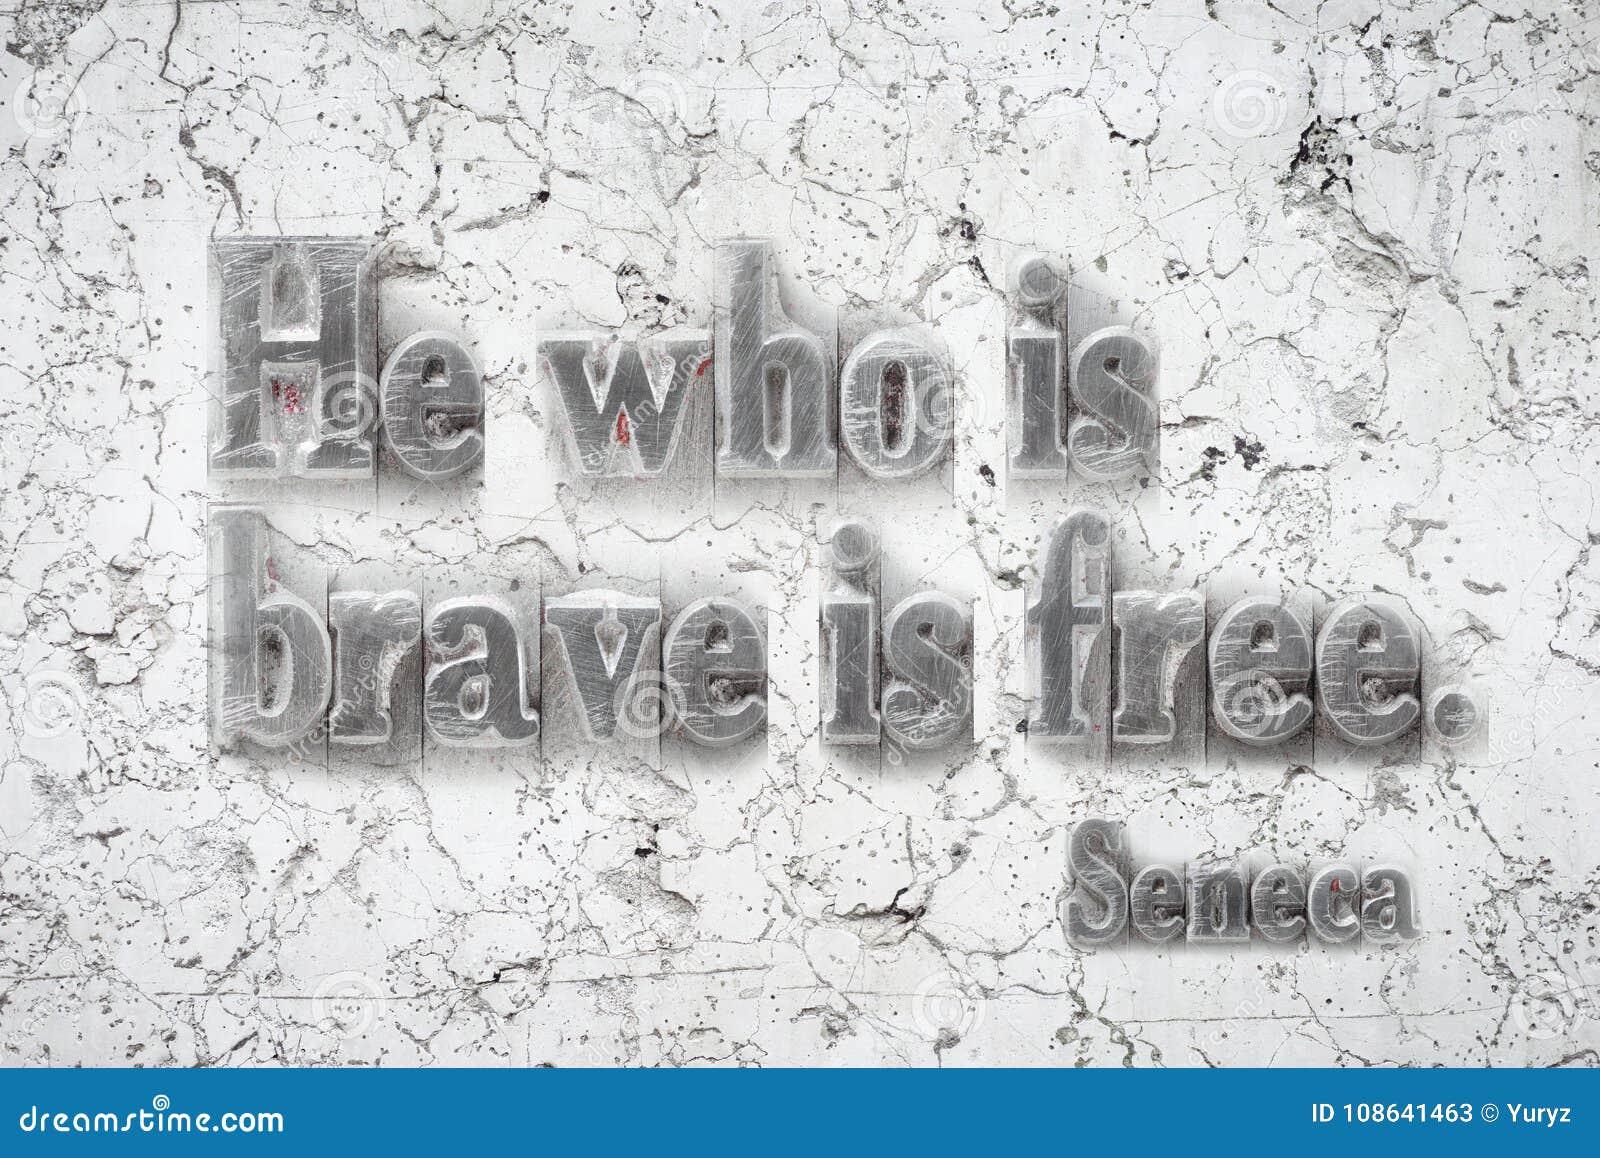 Wer tapferer Seneca ist